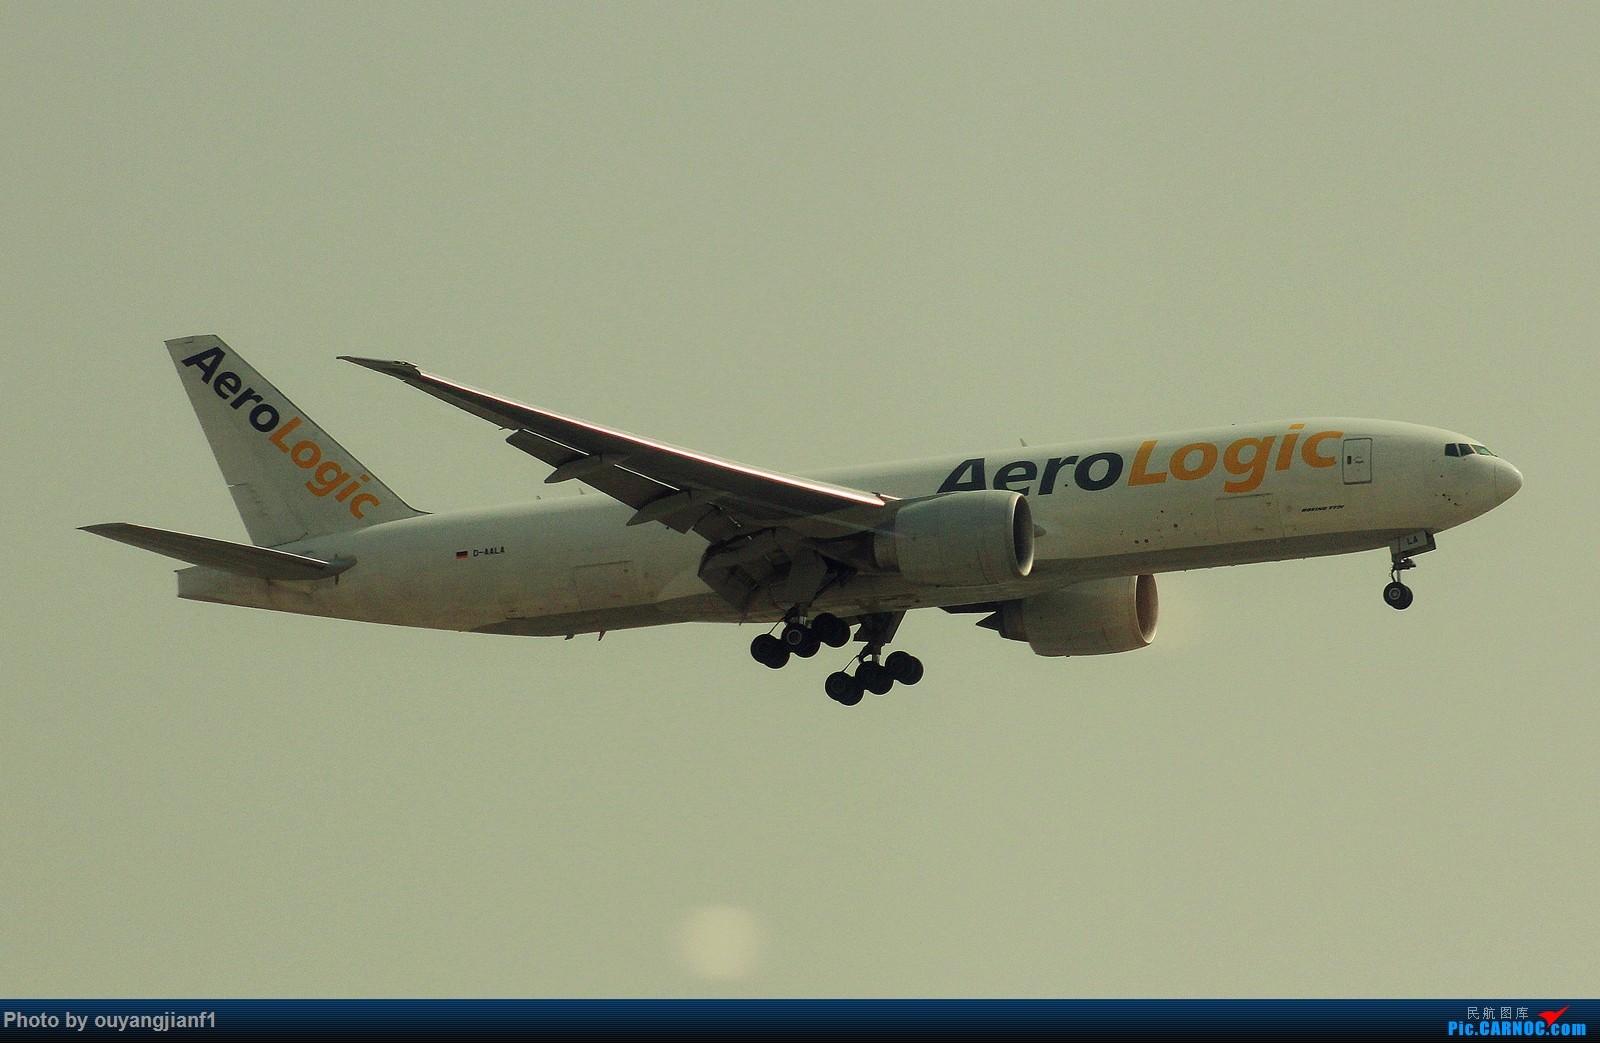 Re:[原创]很多年没有来贴图区了,记一次本不在计划中的迪拜拍机之行,在漫天黄沙中EK的380和777真的看到吐血.... BOEING 777-200F D-AALA 阿拉伯联合酋长国迪拜国际机场